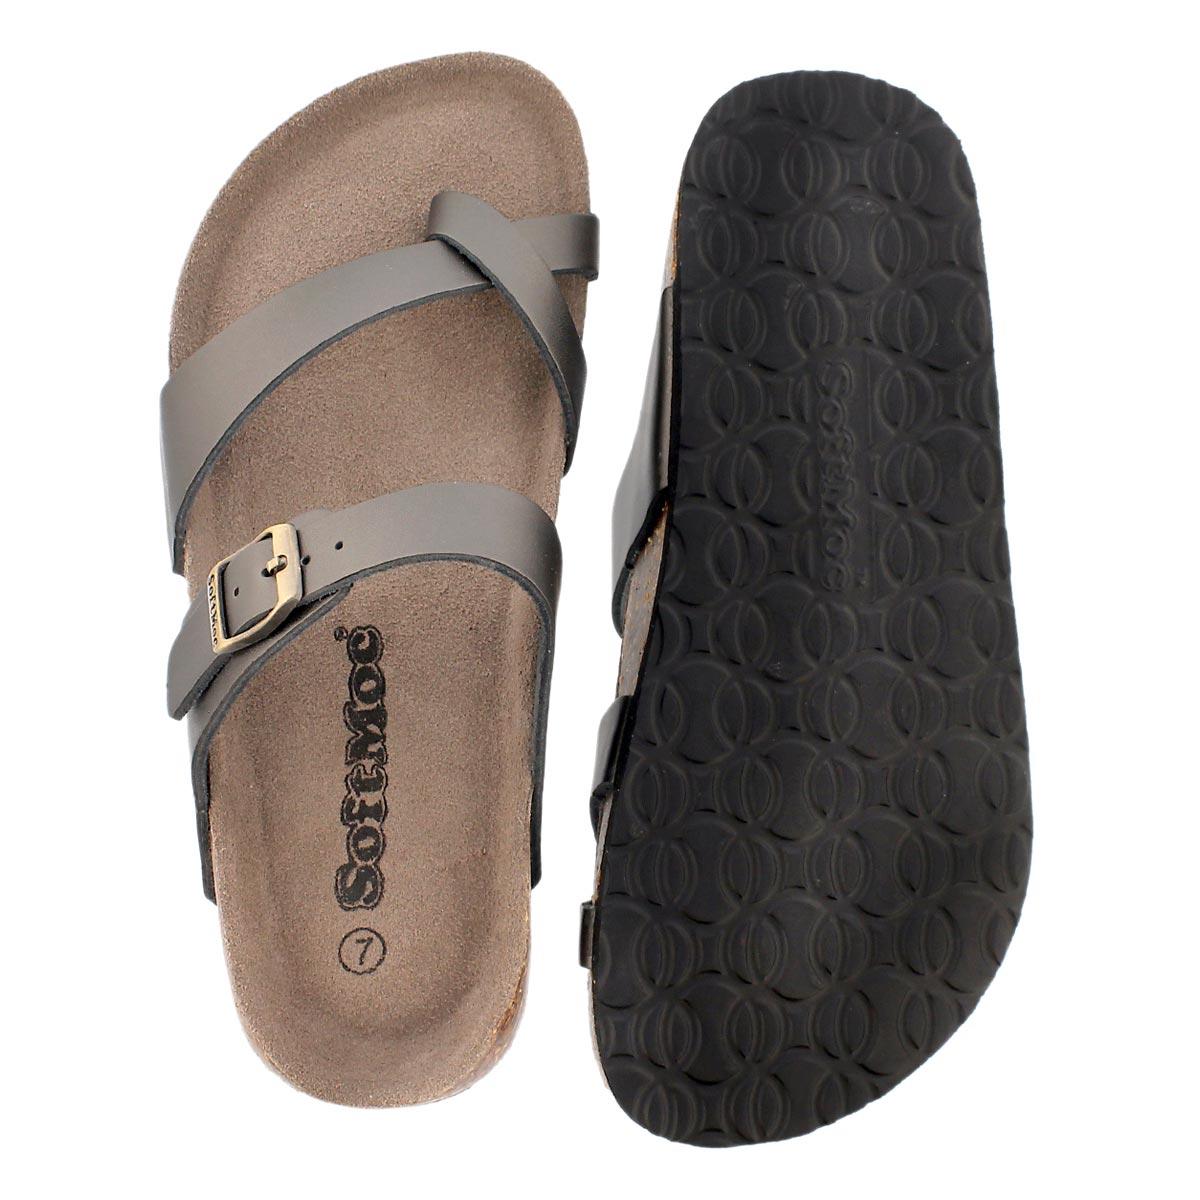 Lds Alicia3 pewter memory foam sandal